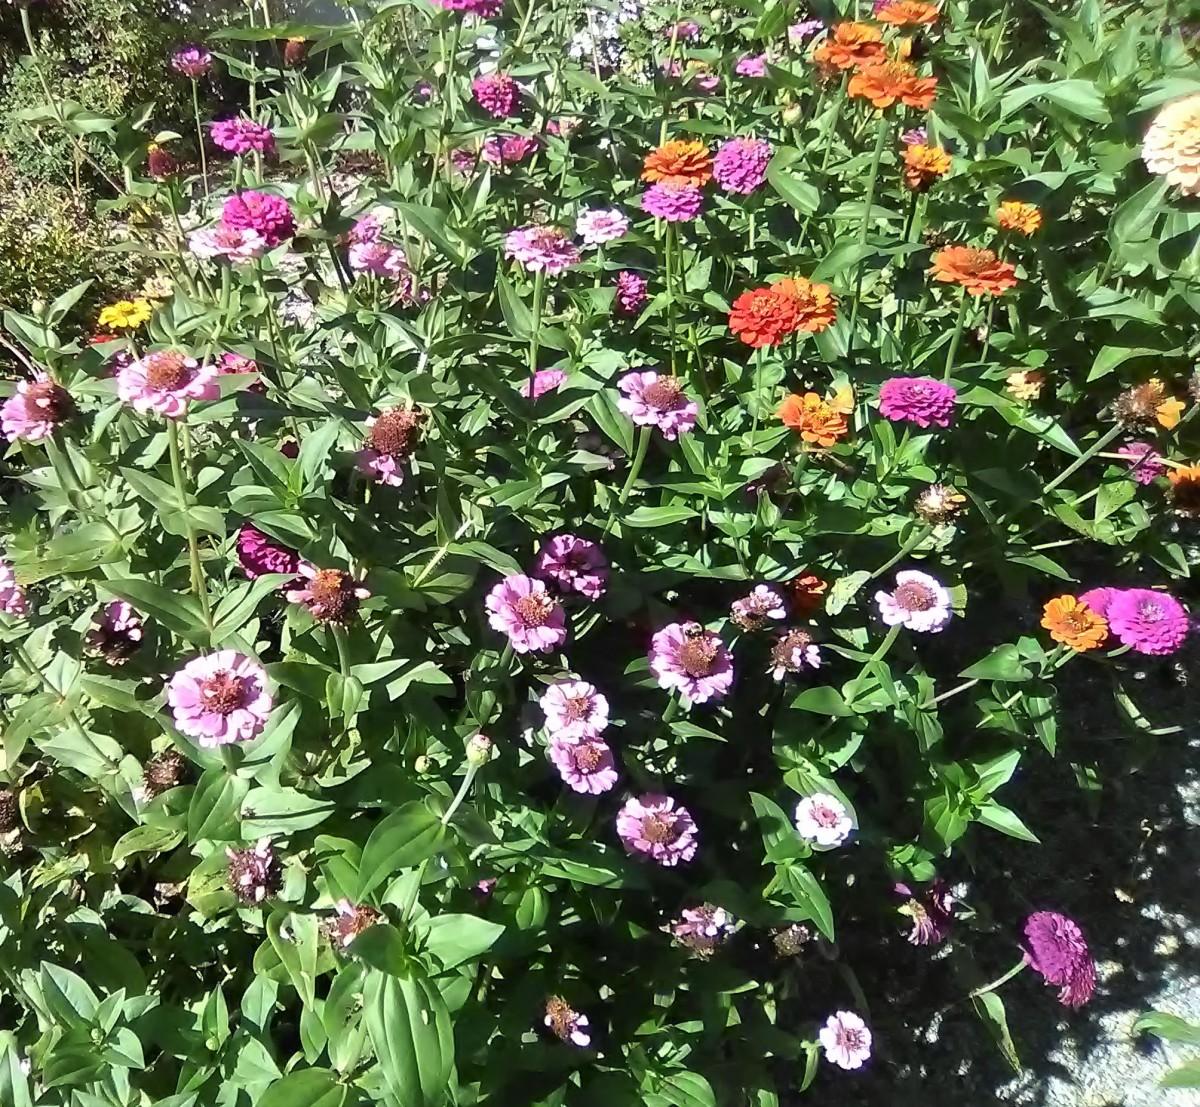 So Many Flowers; So Many Colors